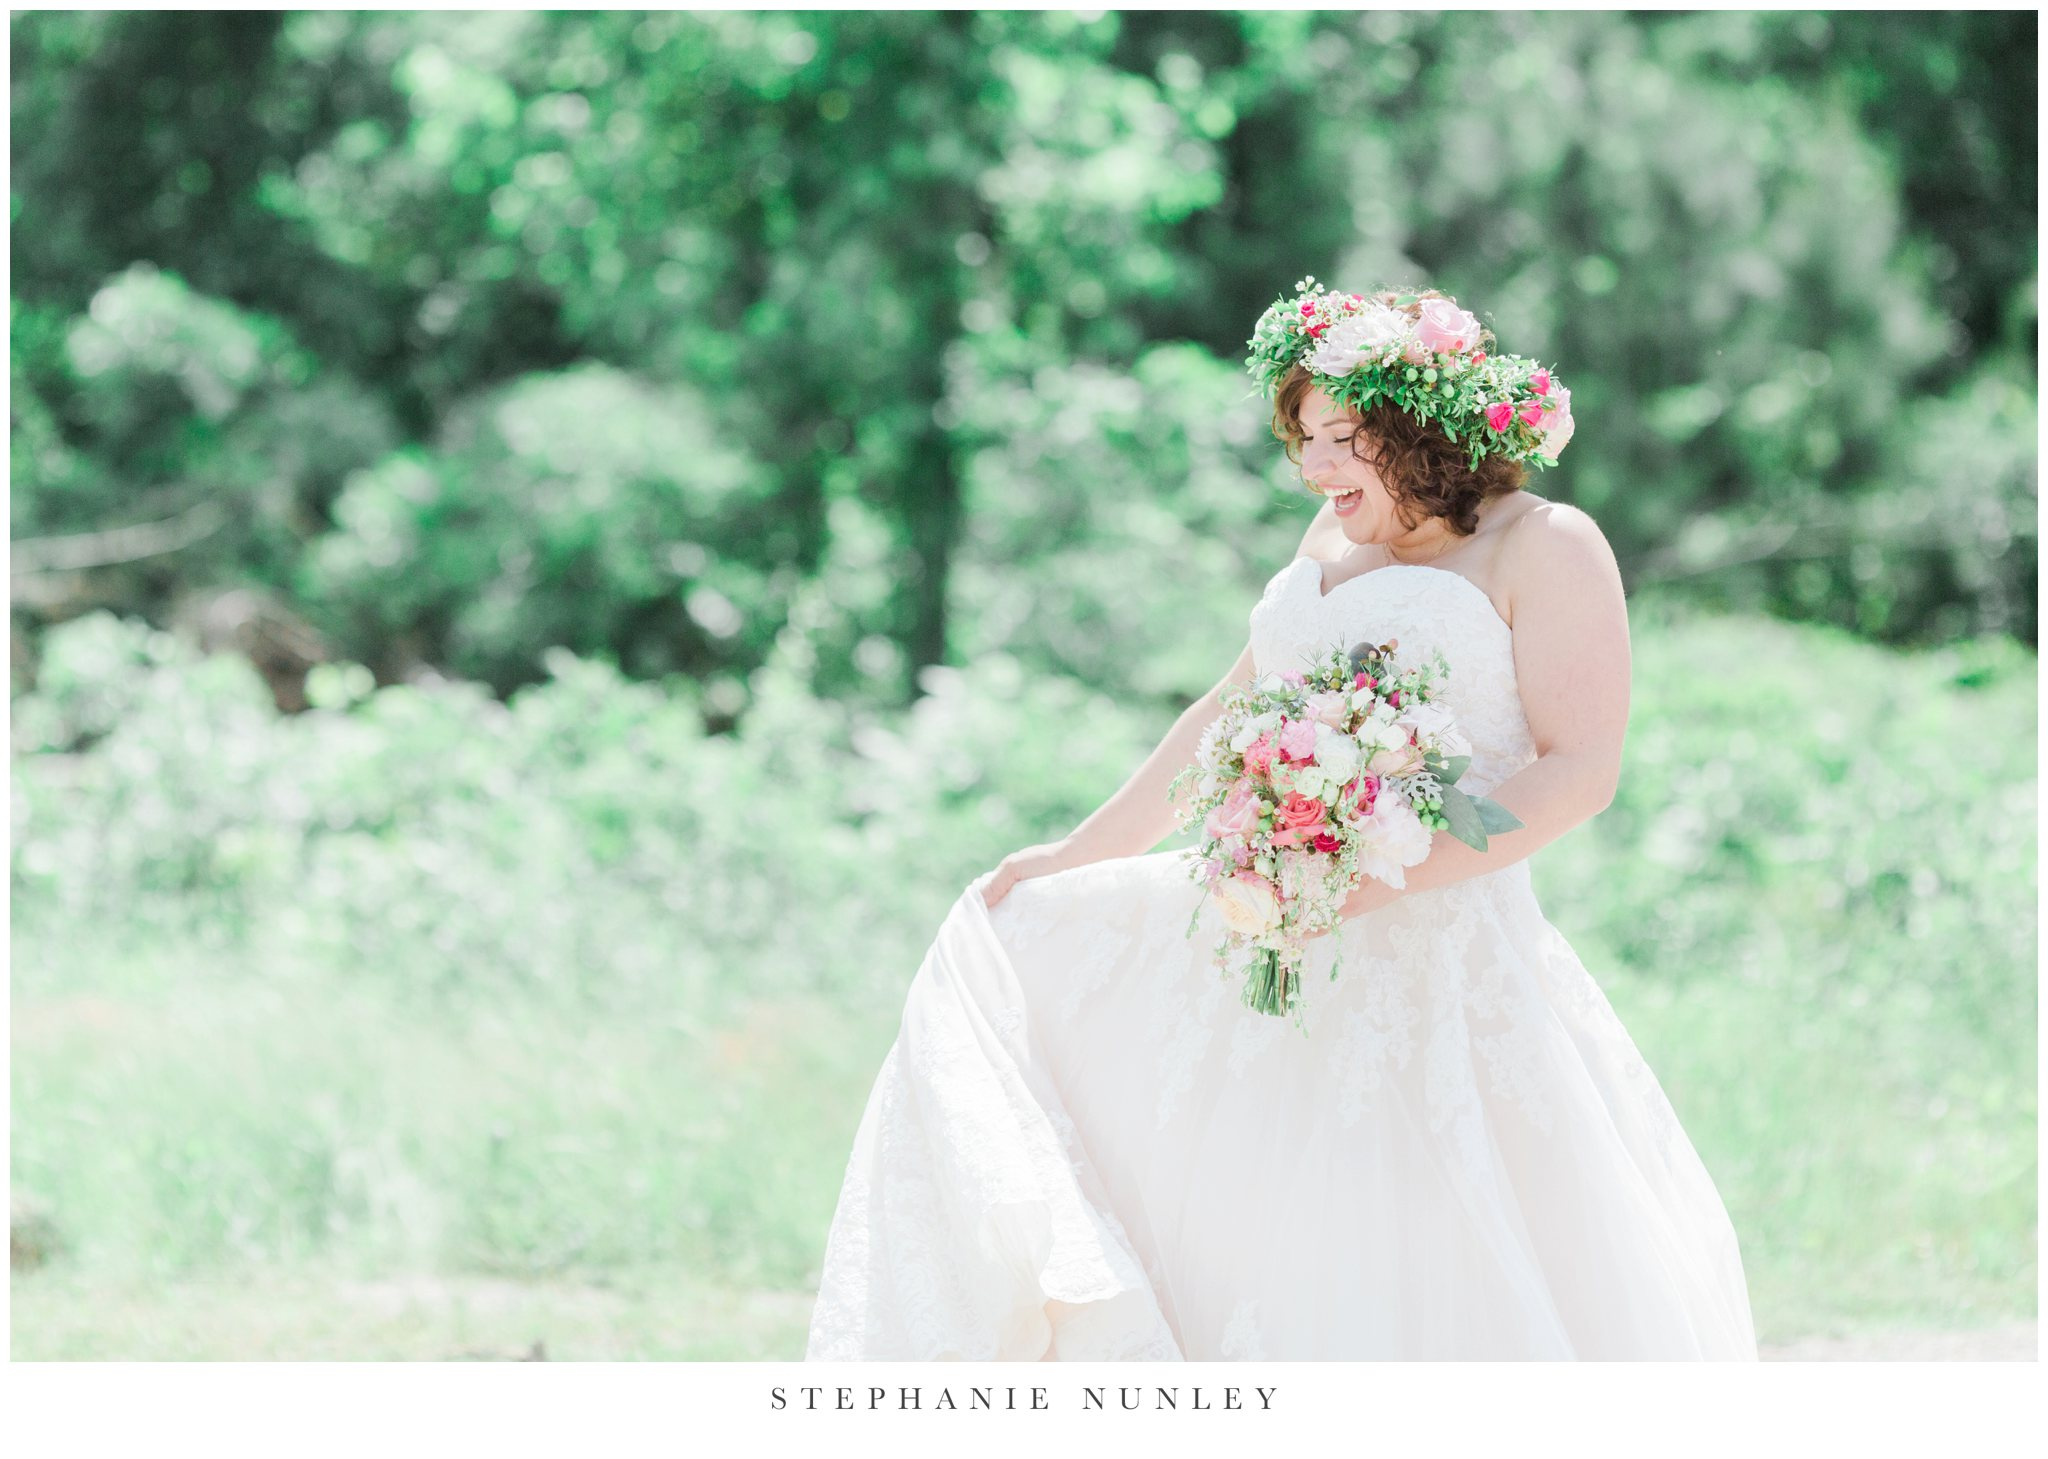 romantic-outdoor-wedding-with-flower-crown-0050.jpg